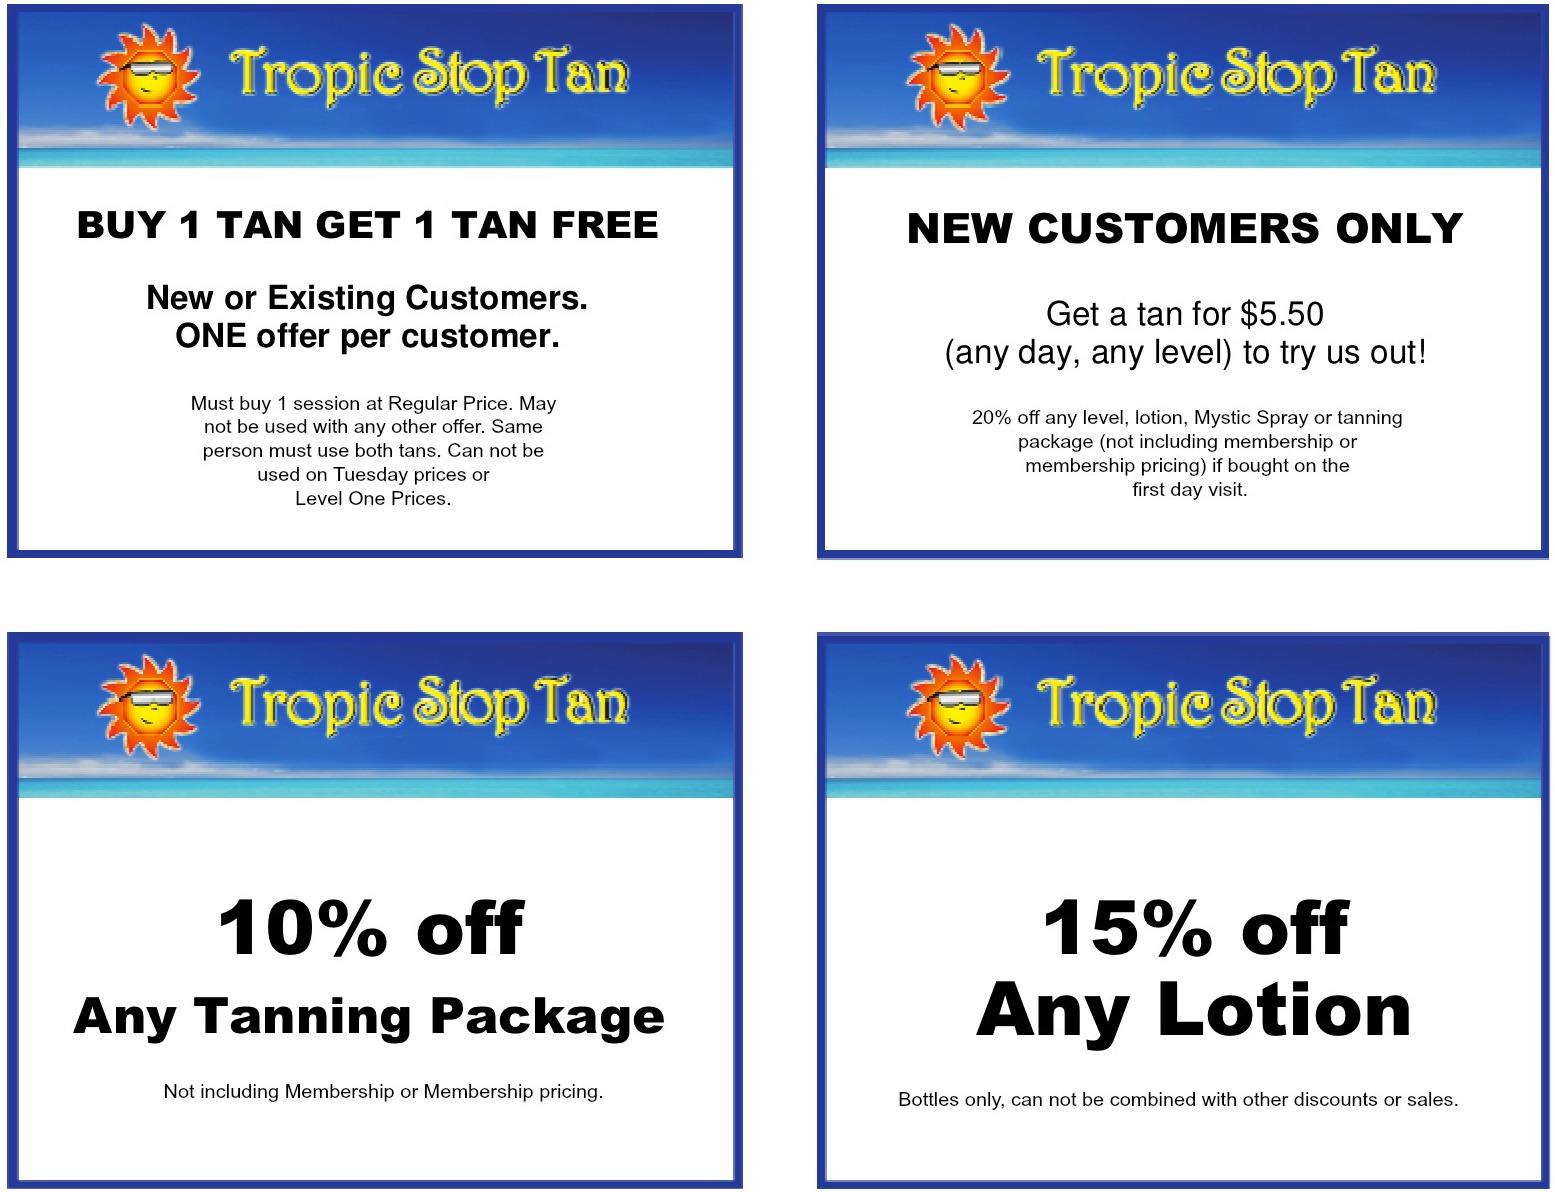 tropic stop tan coupons